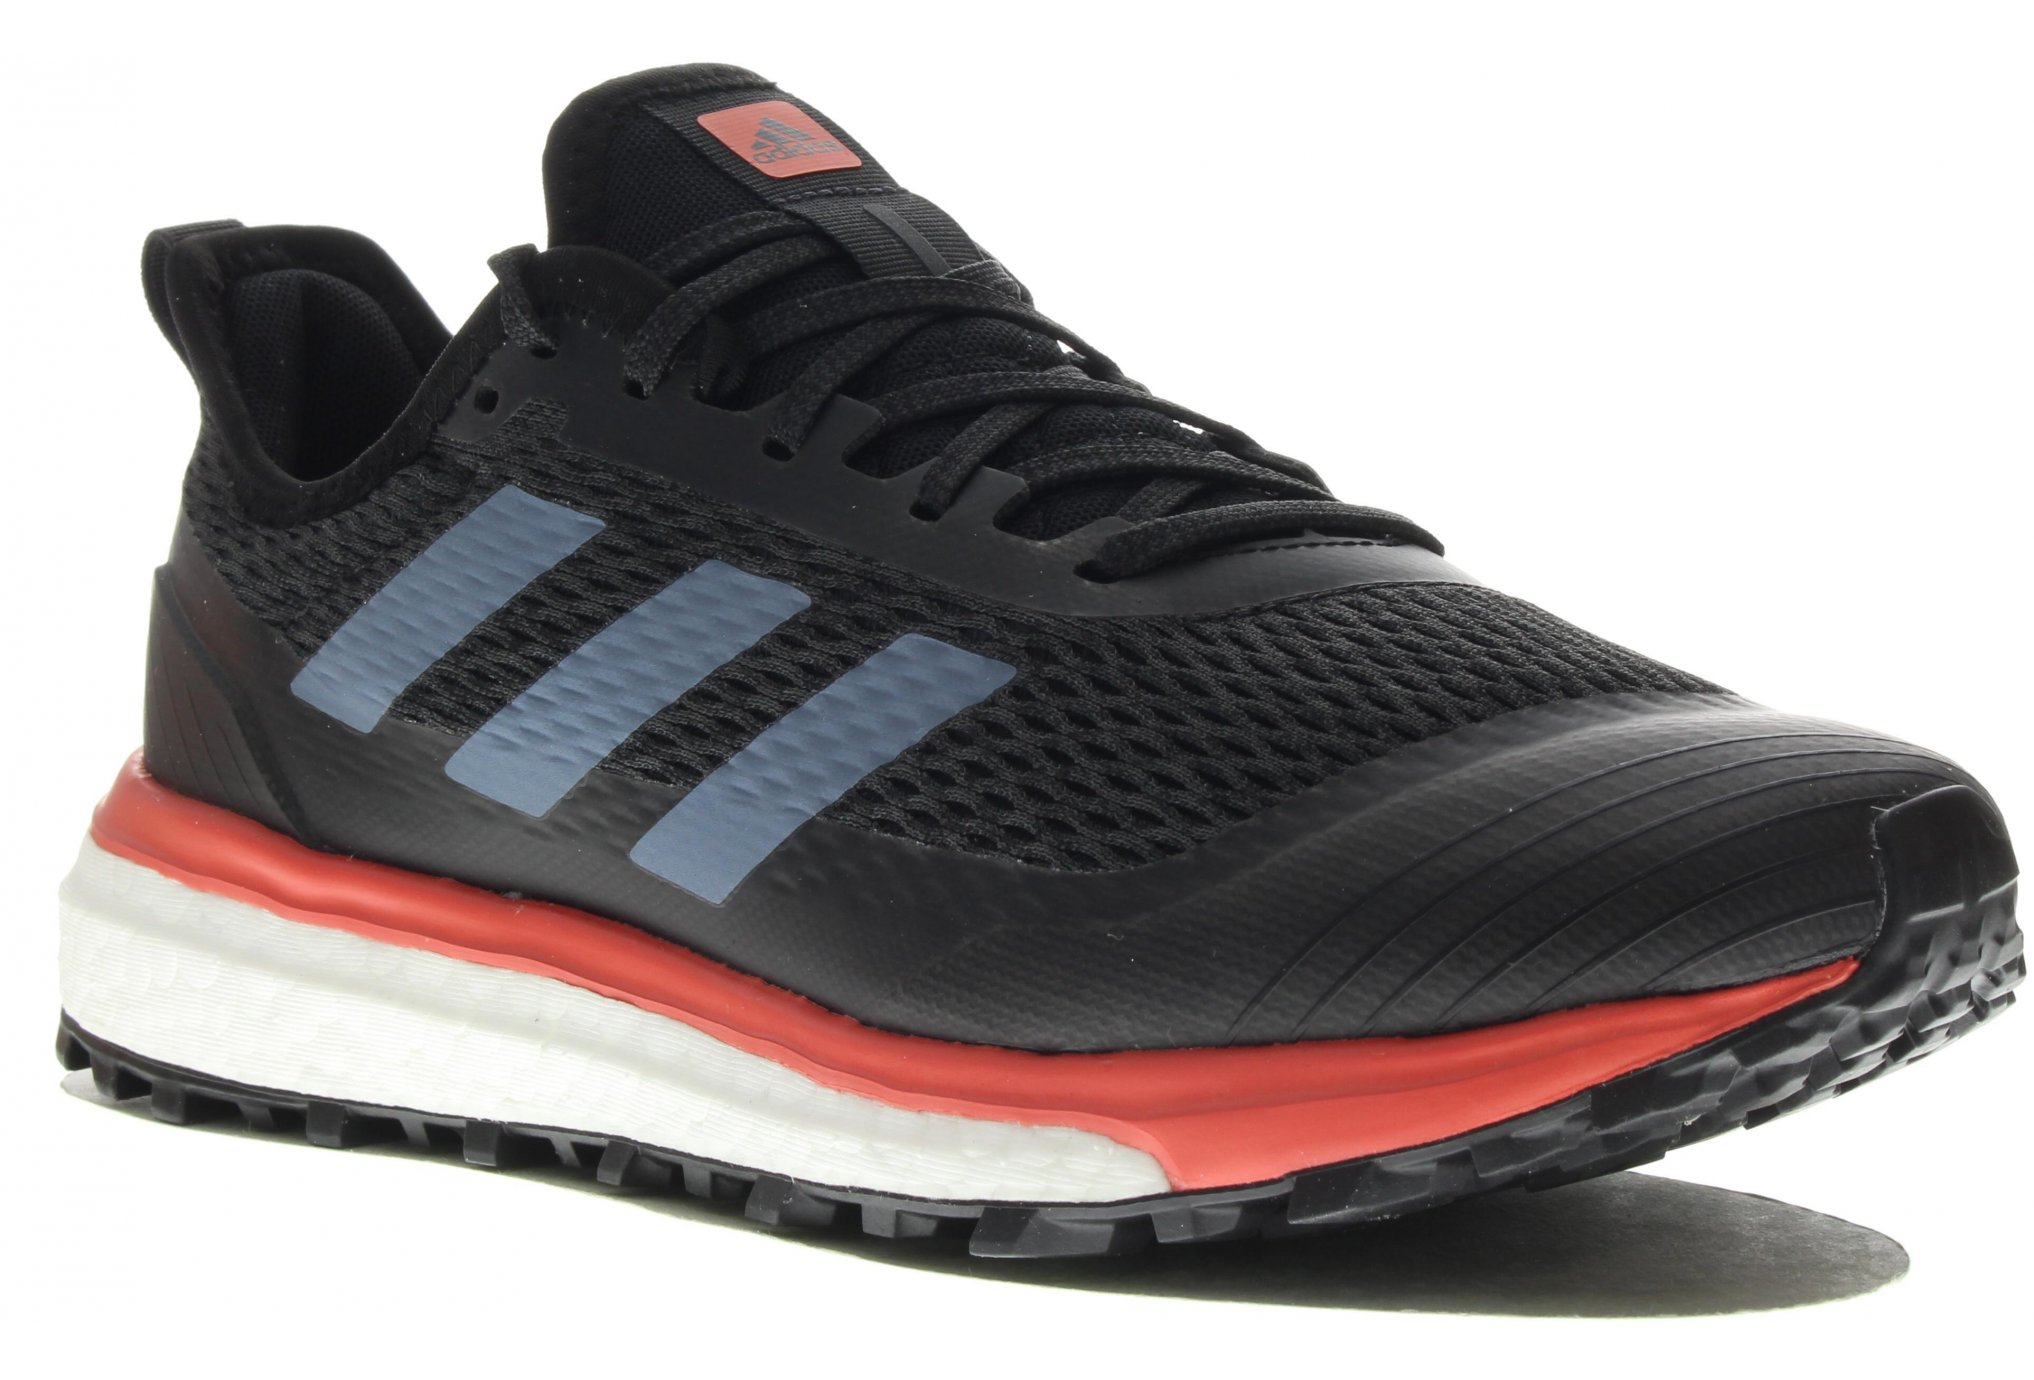 chaussure running chaussures running femme trail tritoo sport. Black Bedroom Furniture Sets. Home Design Ideas